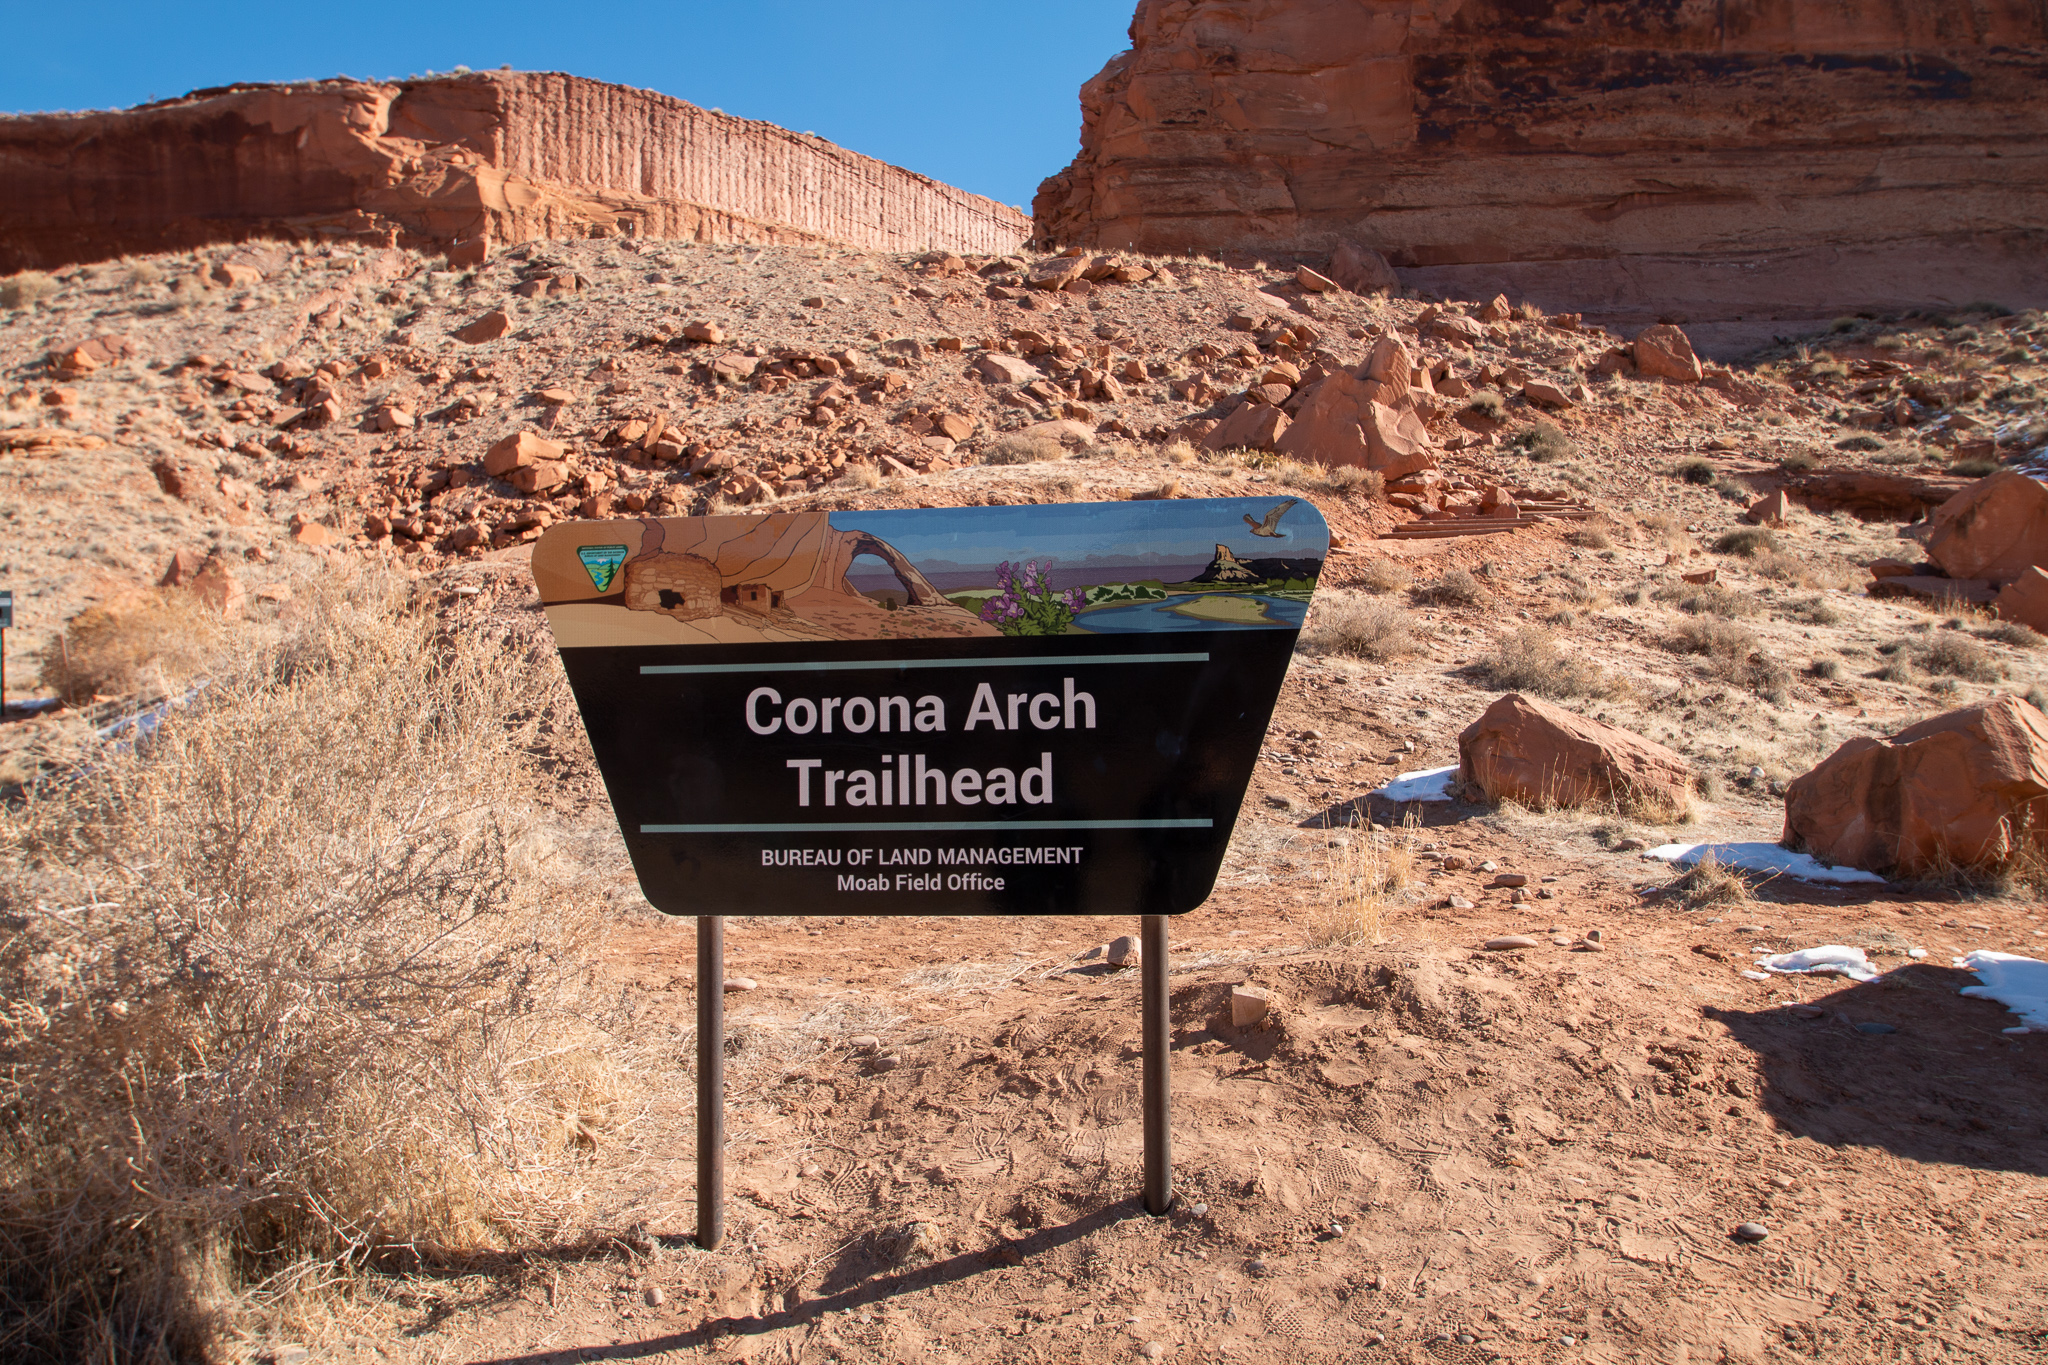 Hiking to Corona Arch